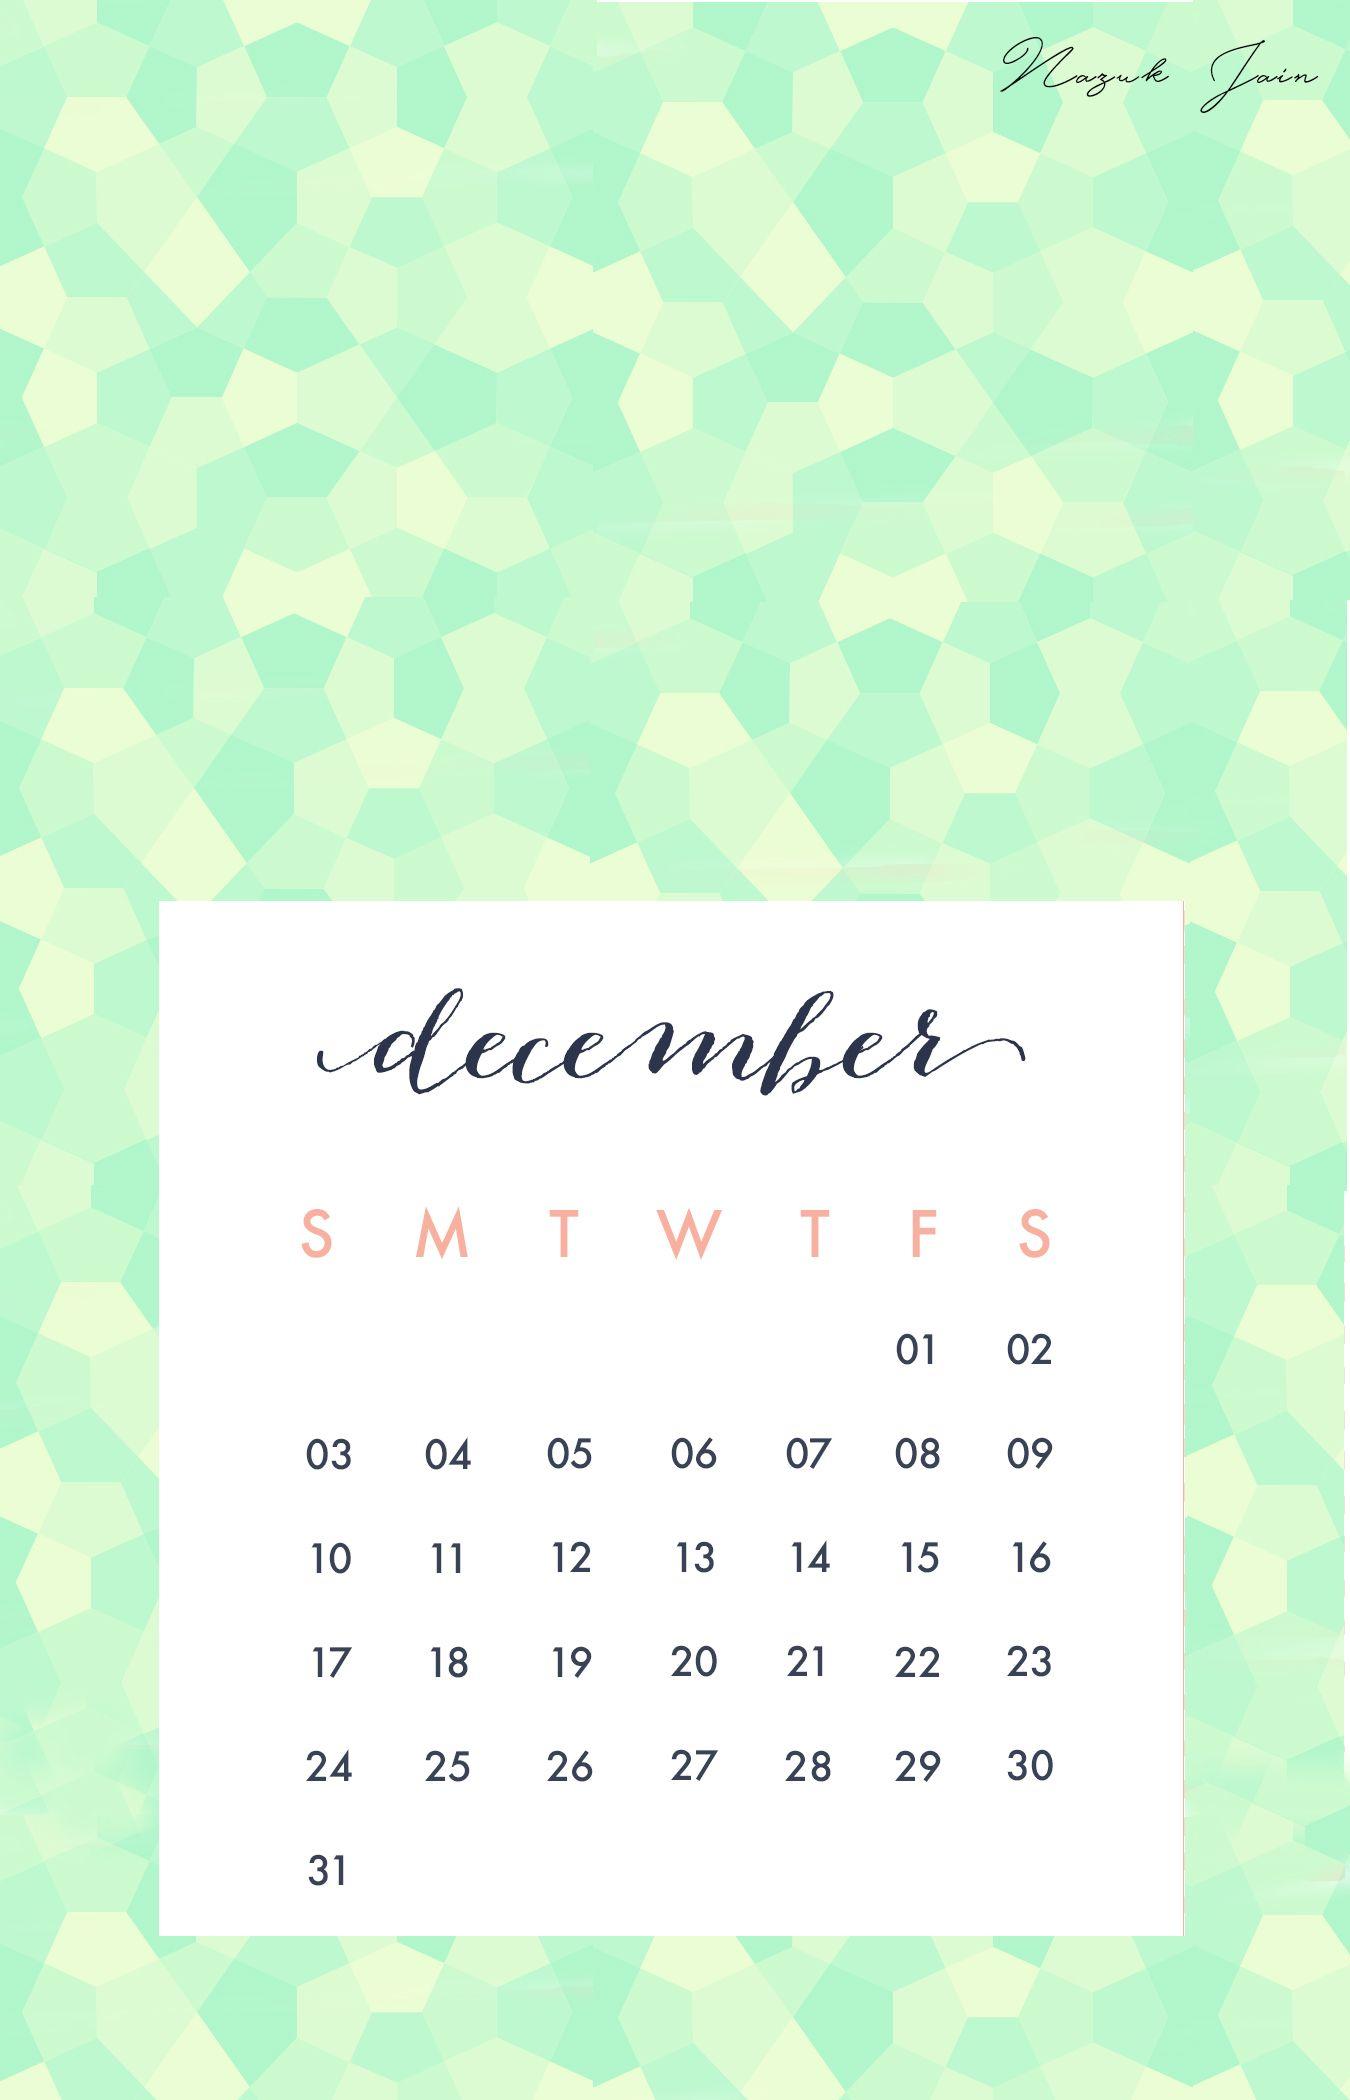 December  Free Calendar Printables  By Nazuk Jain  Calendar